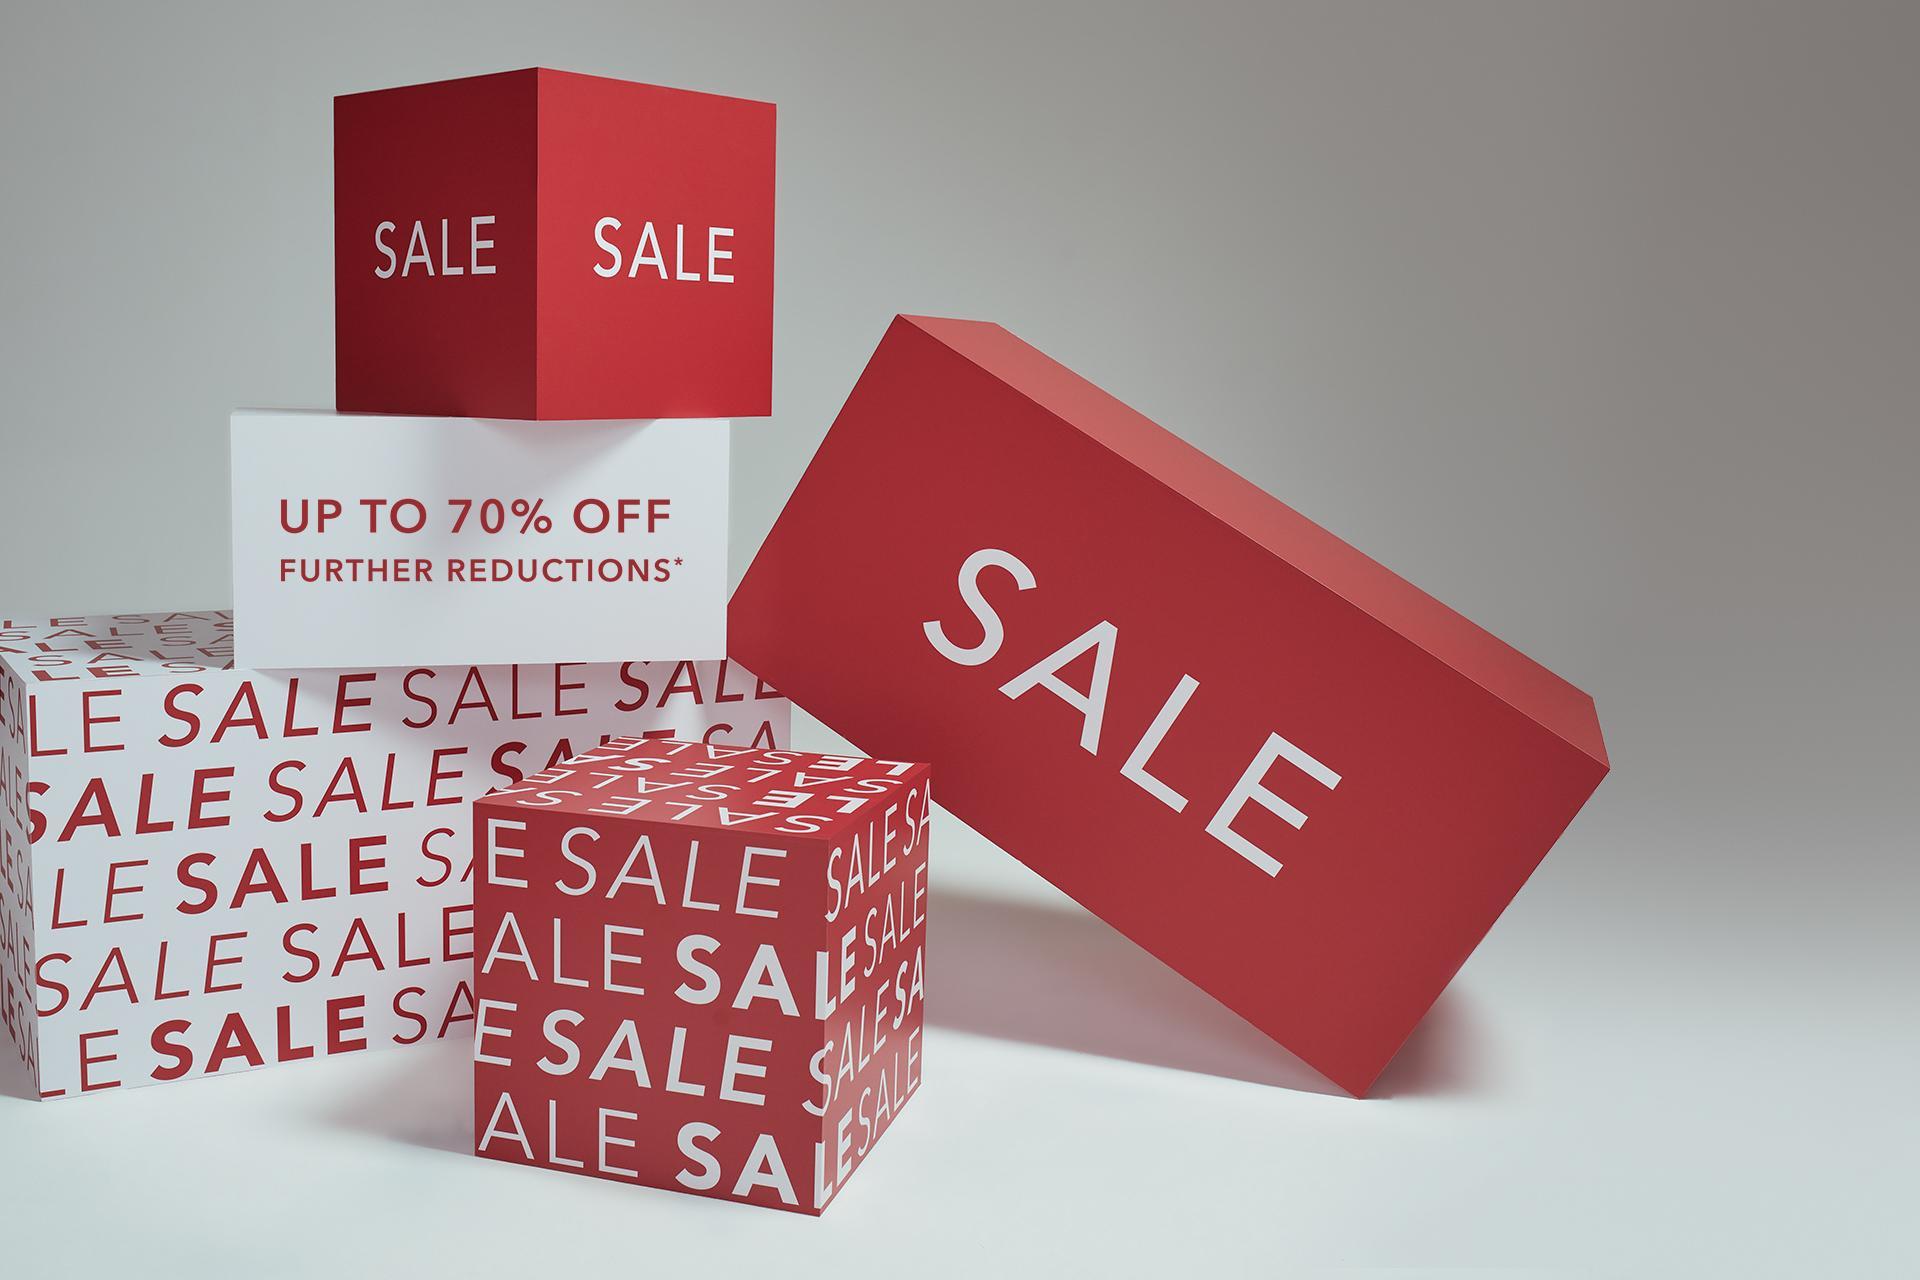 c952be45e The Fenwick Sale - Up to 70% Off Men's & Women's Fashion | Fenwick